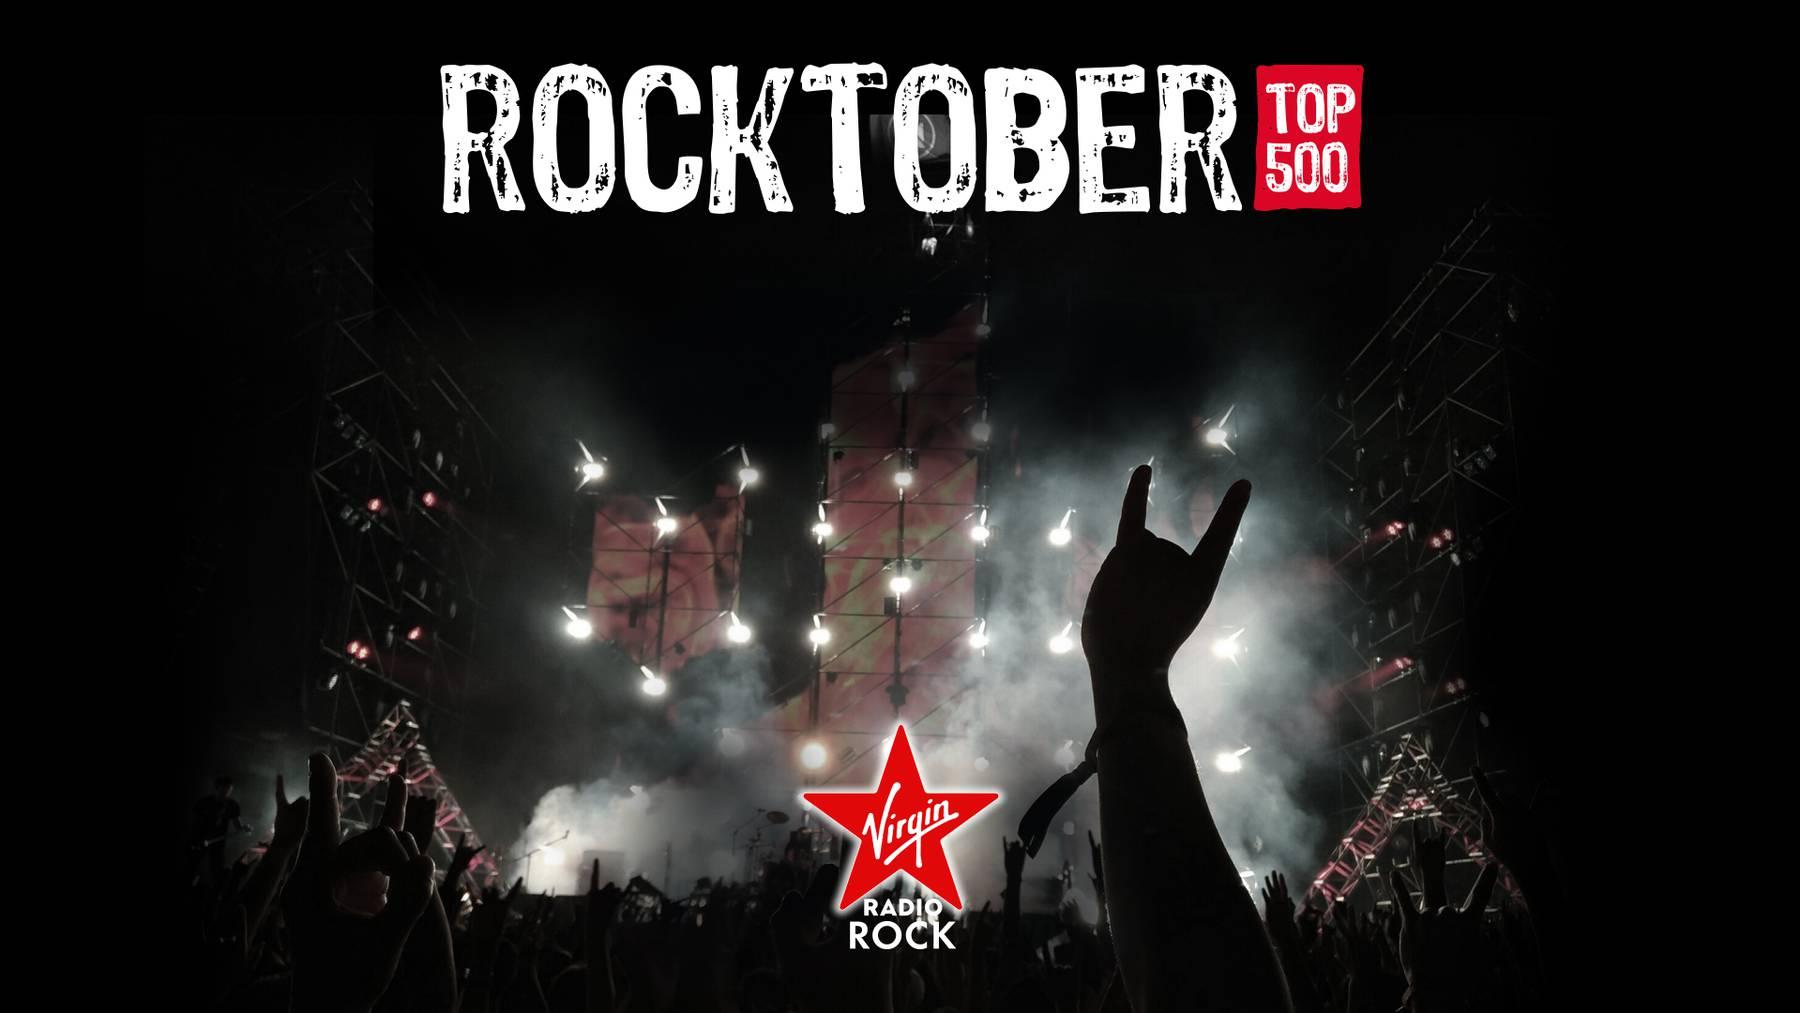 RZ_200928_Virgin-Rock-Rocktober_Webbild_1920x1080px_ohne-Text